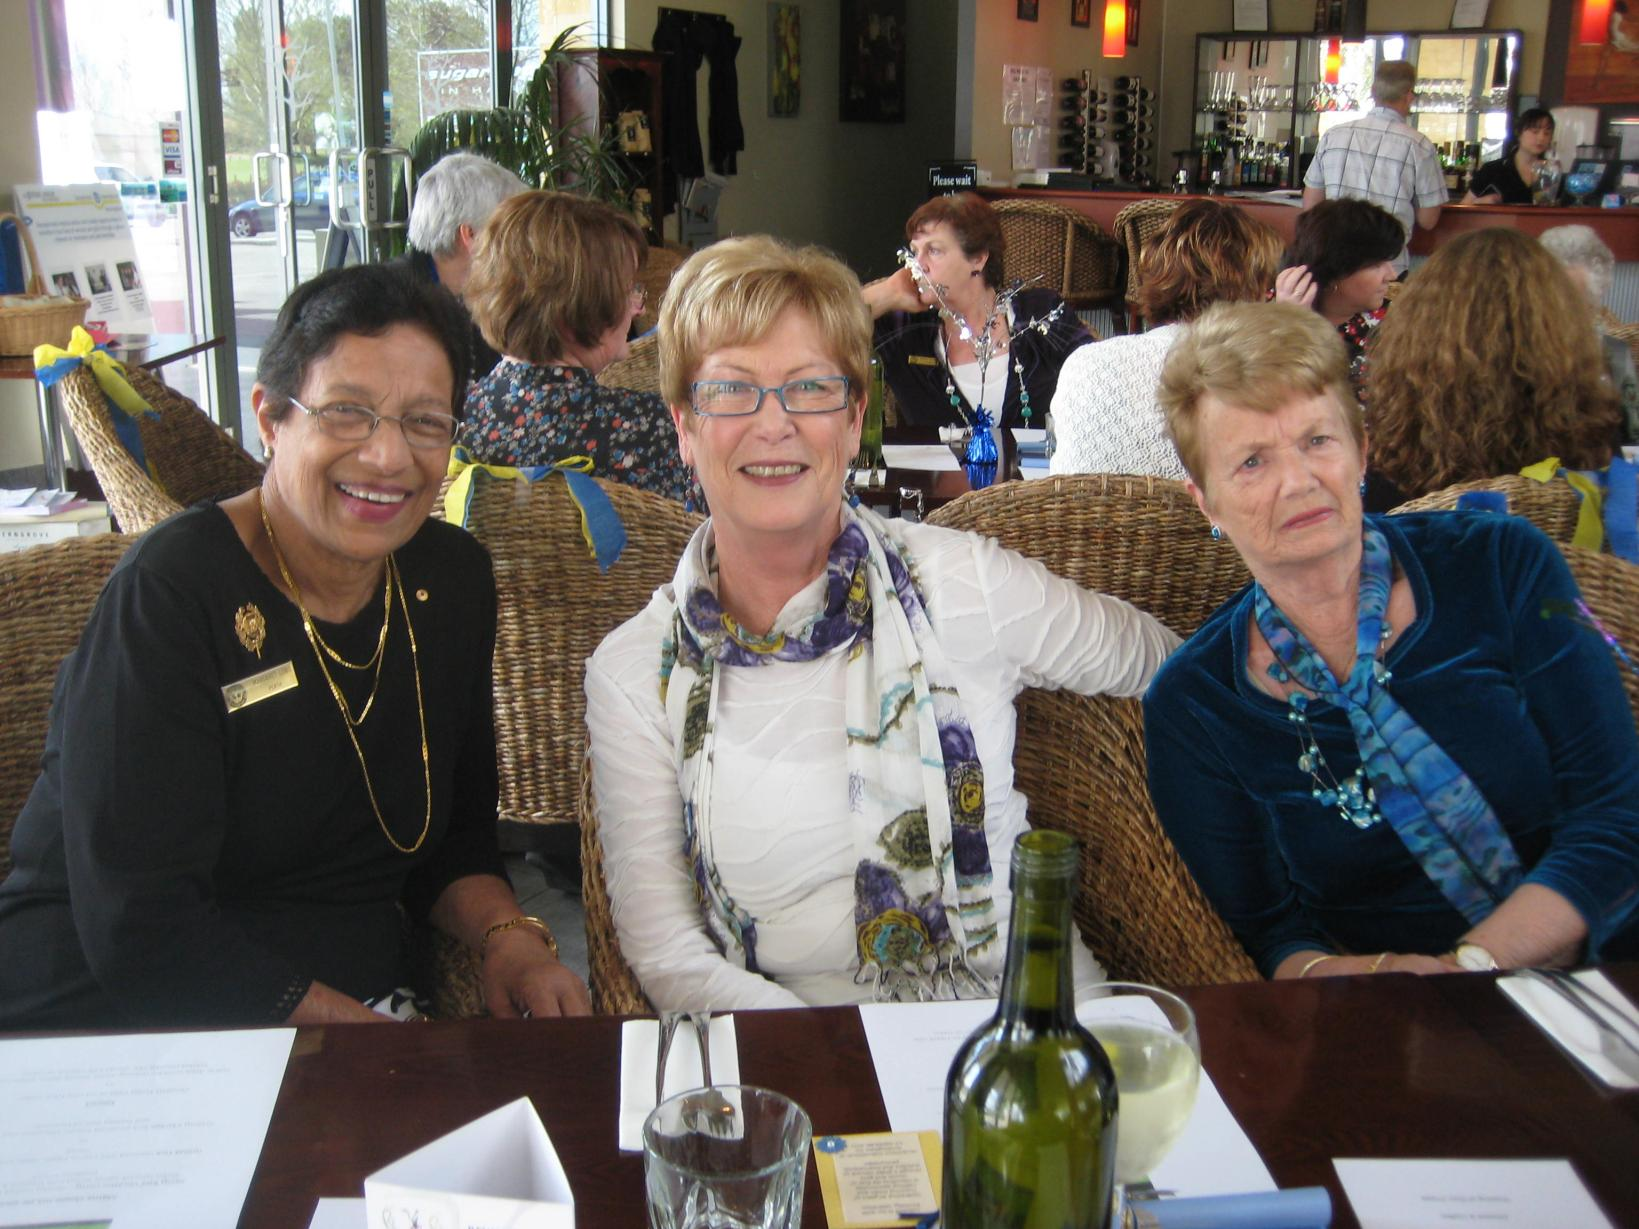 Margaret Lobo SI Perth, Joan Motherwell SI Rockingham and Maureen Butts 'SI Rockingham